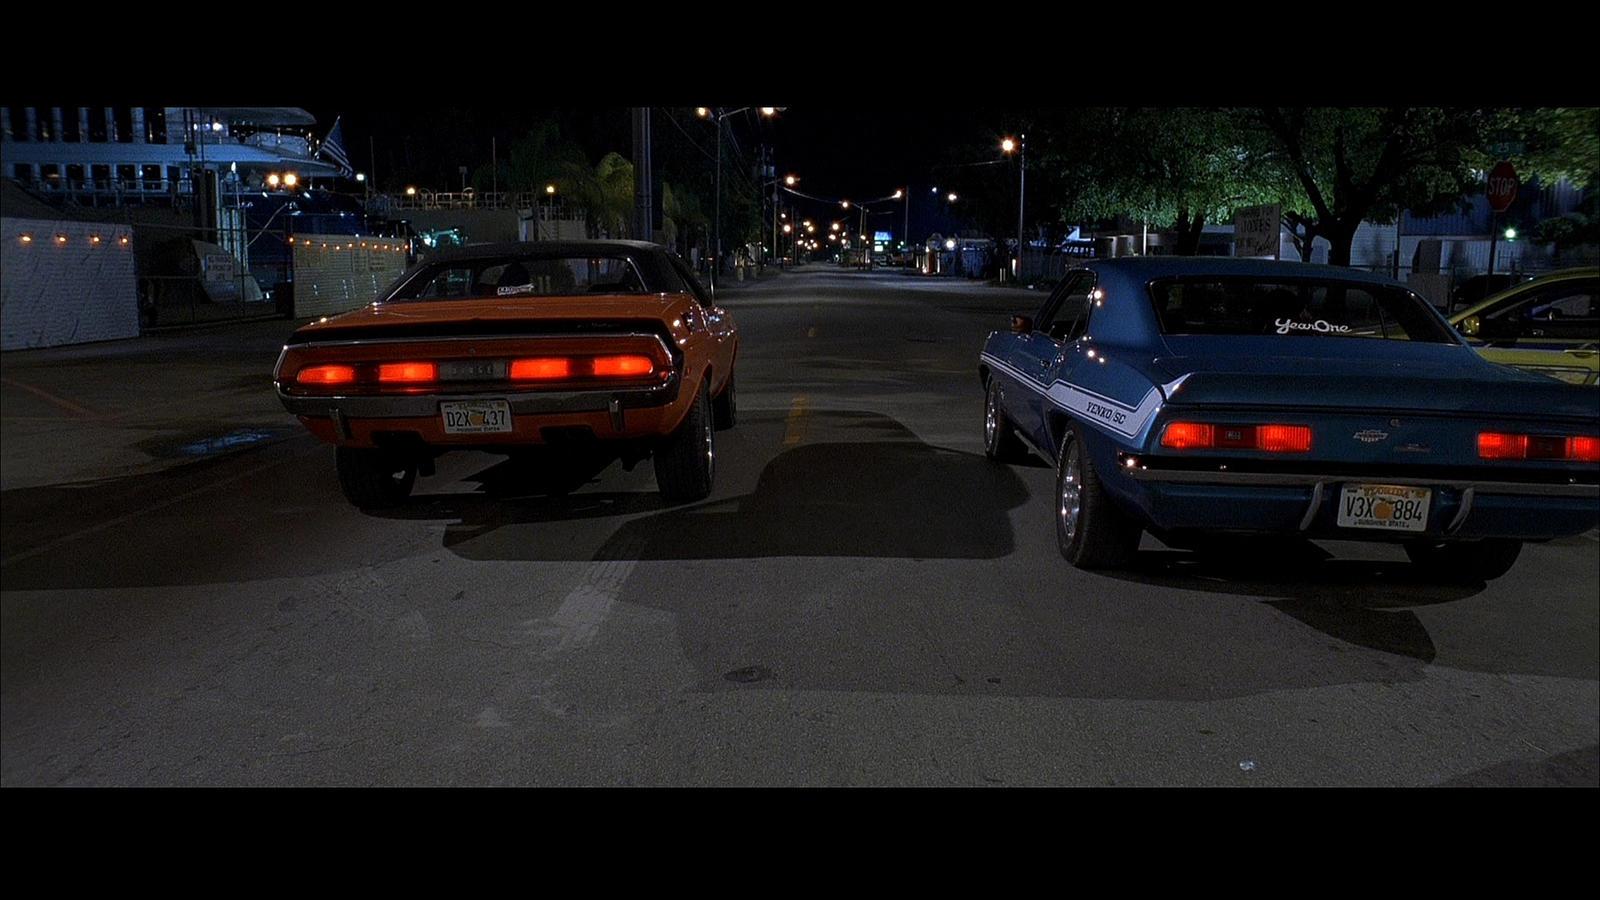 Fast Furious Muscle Cars By NewYungGun On DeviantArt - 2 fast 2 furious cars